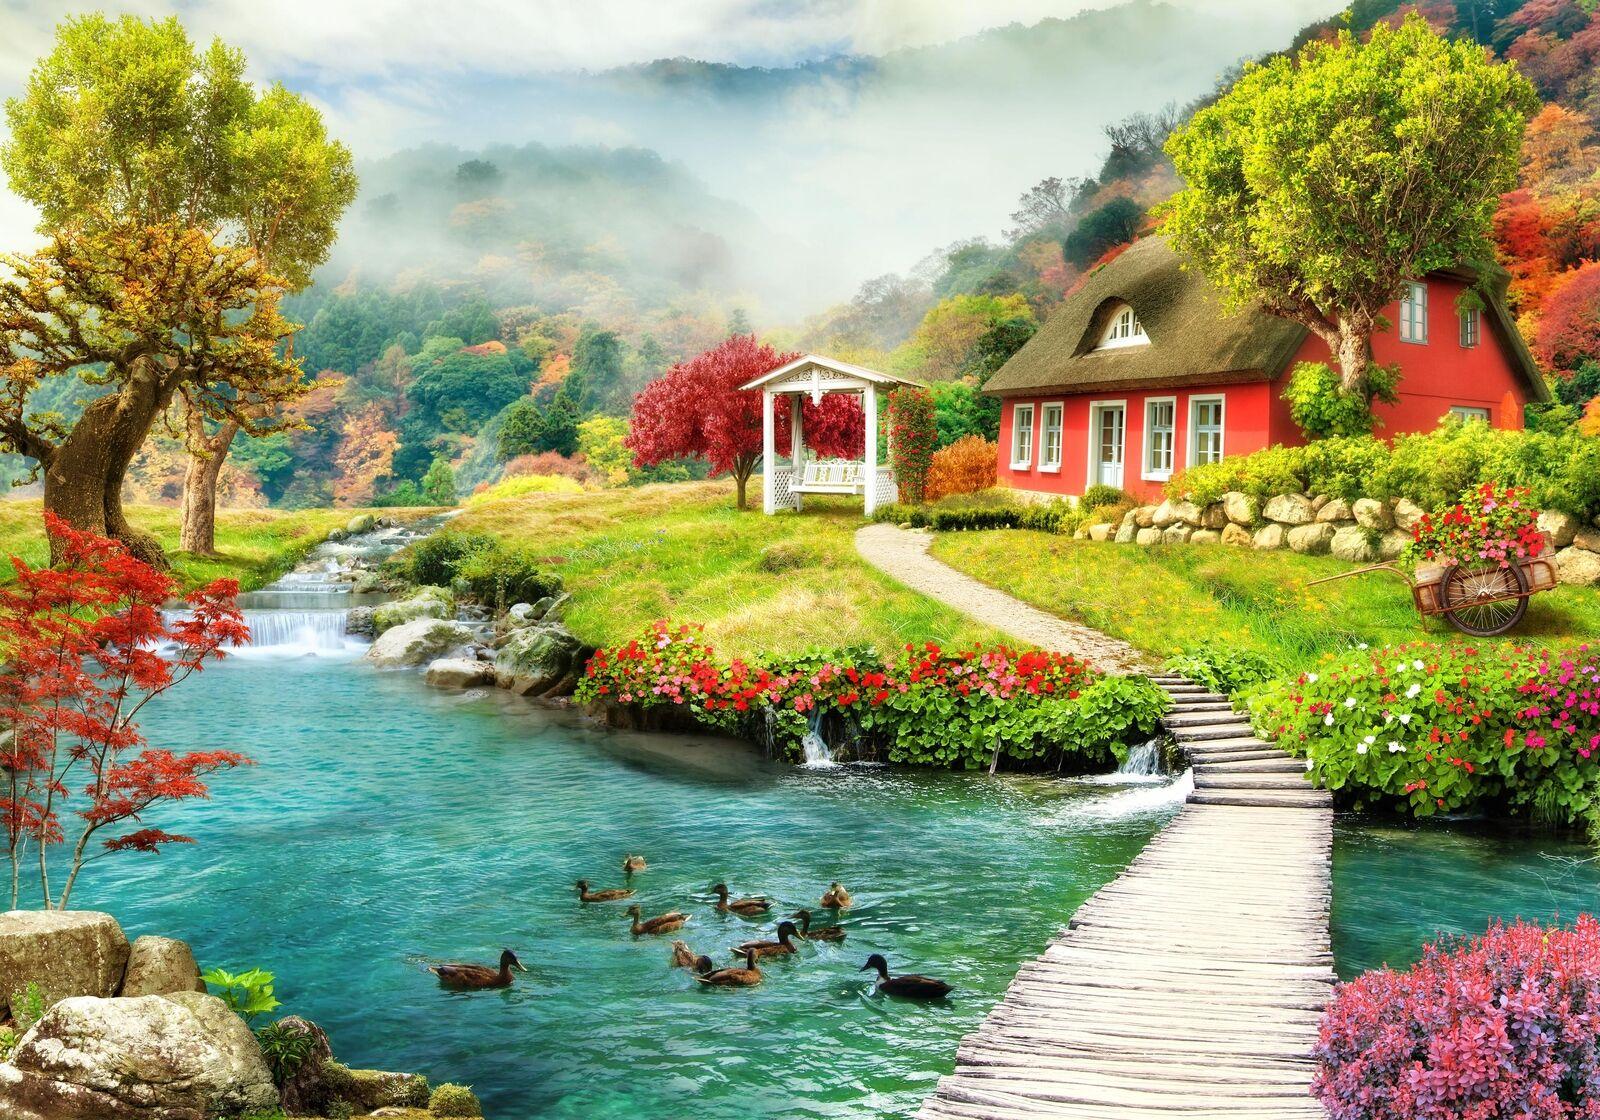 Fototapete Landhaus Bach Wiese Enten Pfad Weg Fluss Nebel trüb Blumen Pflanzen